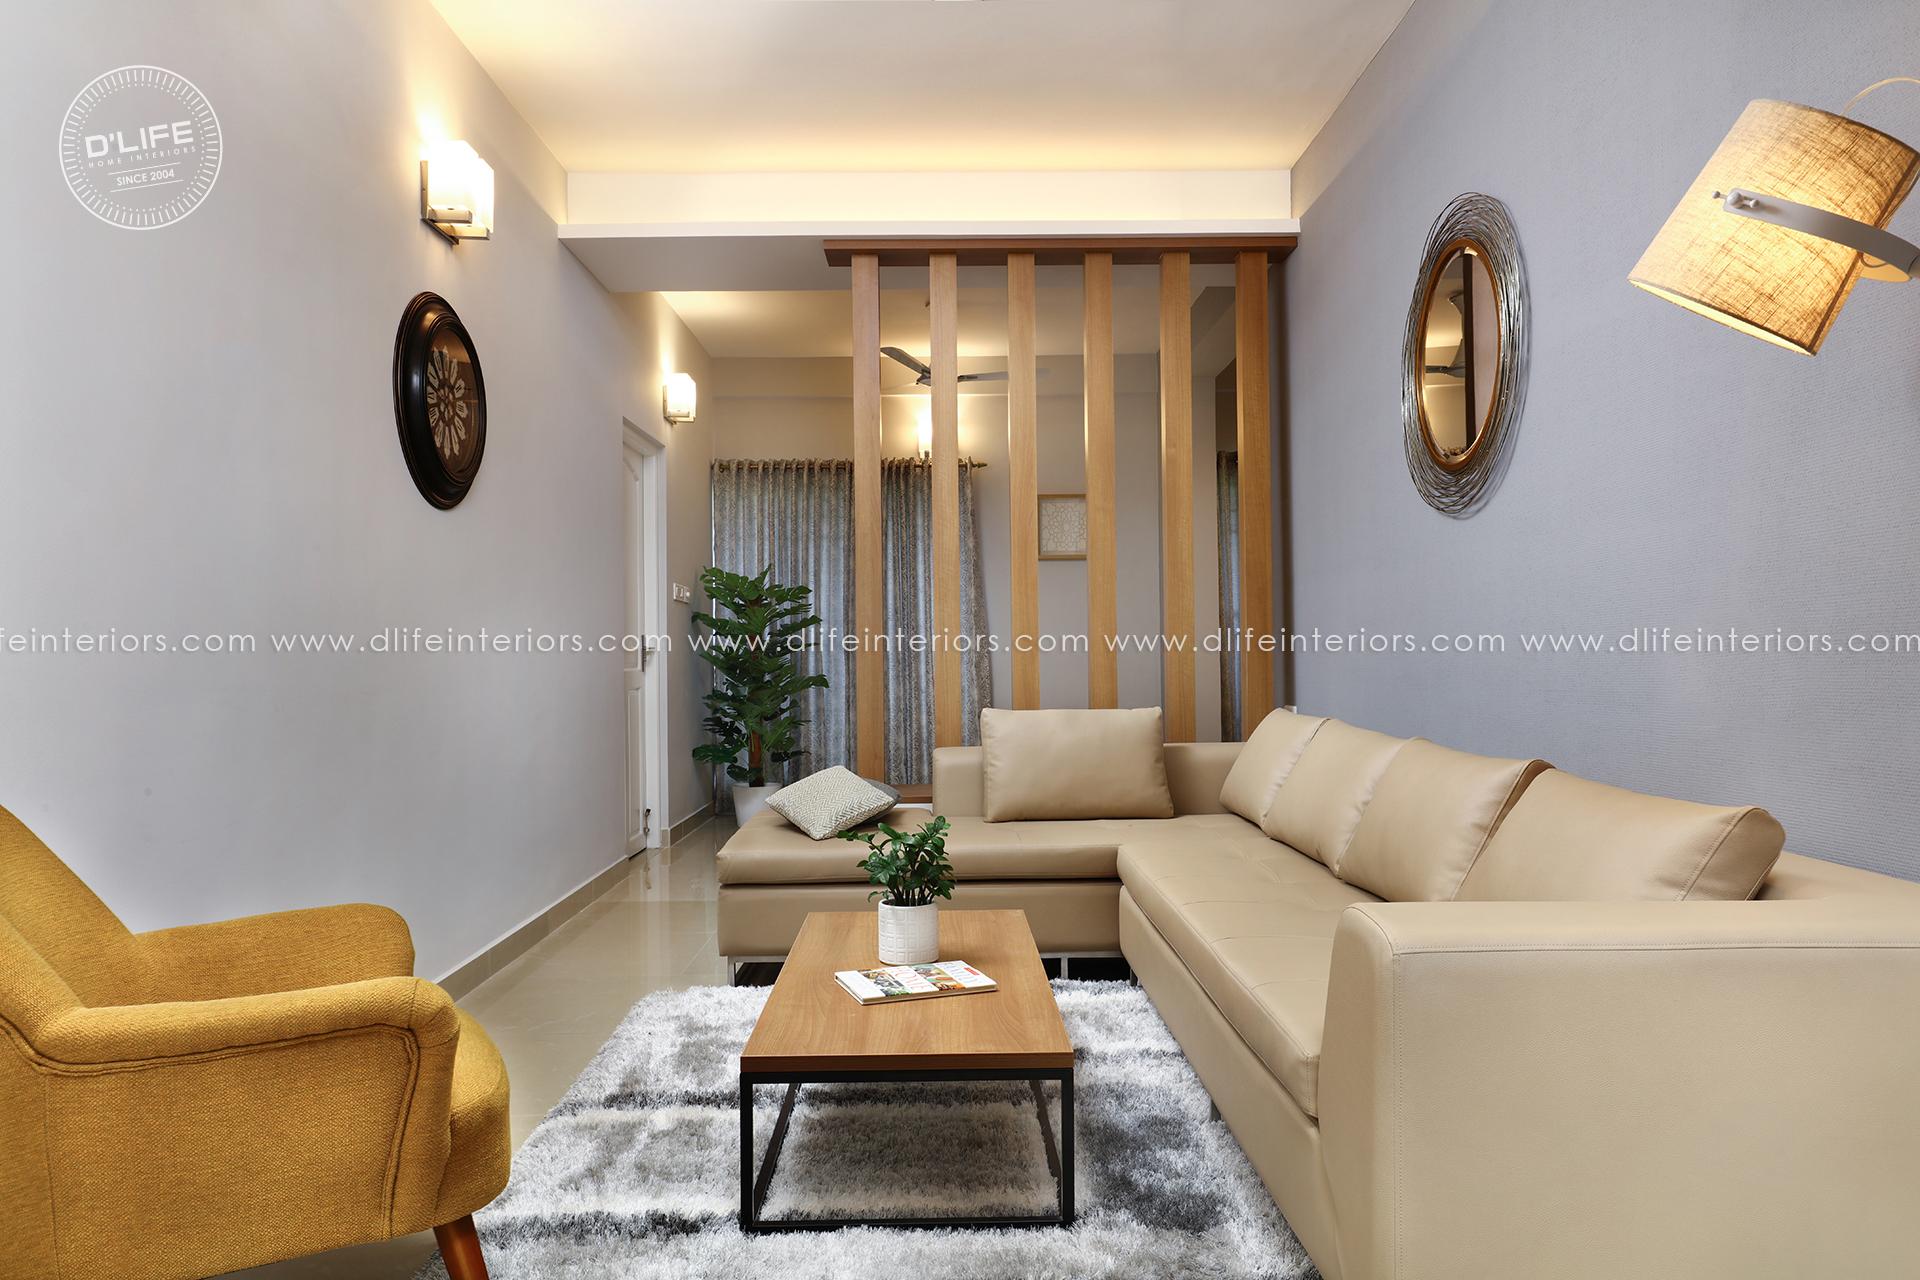 Top 10 Interior Designers In Kottayam Best Interior Decorators Kottayam Sulekha